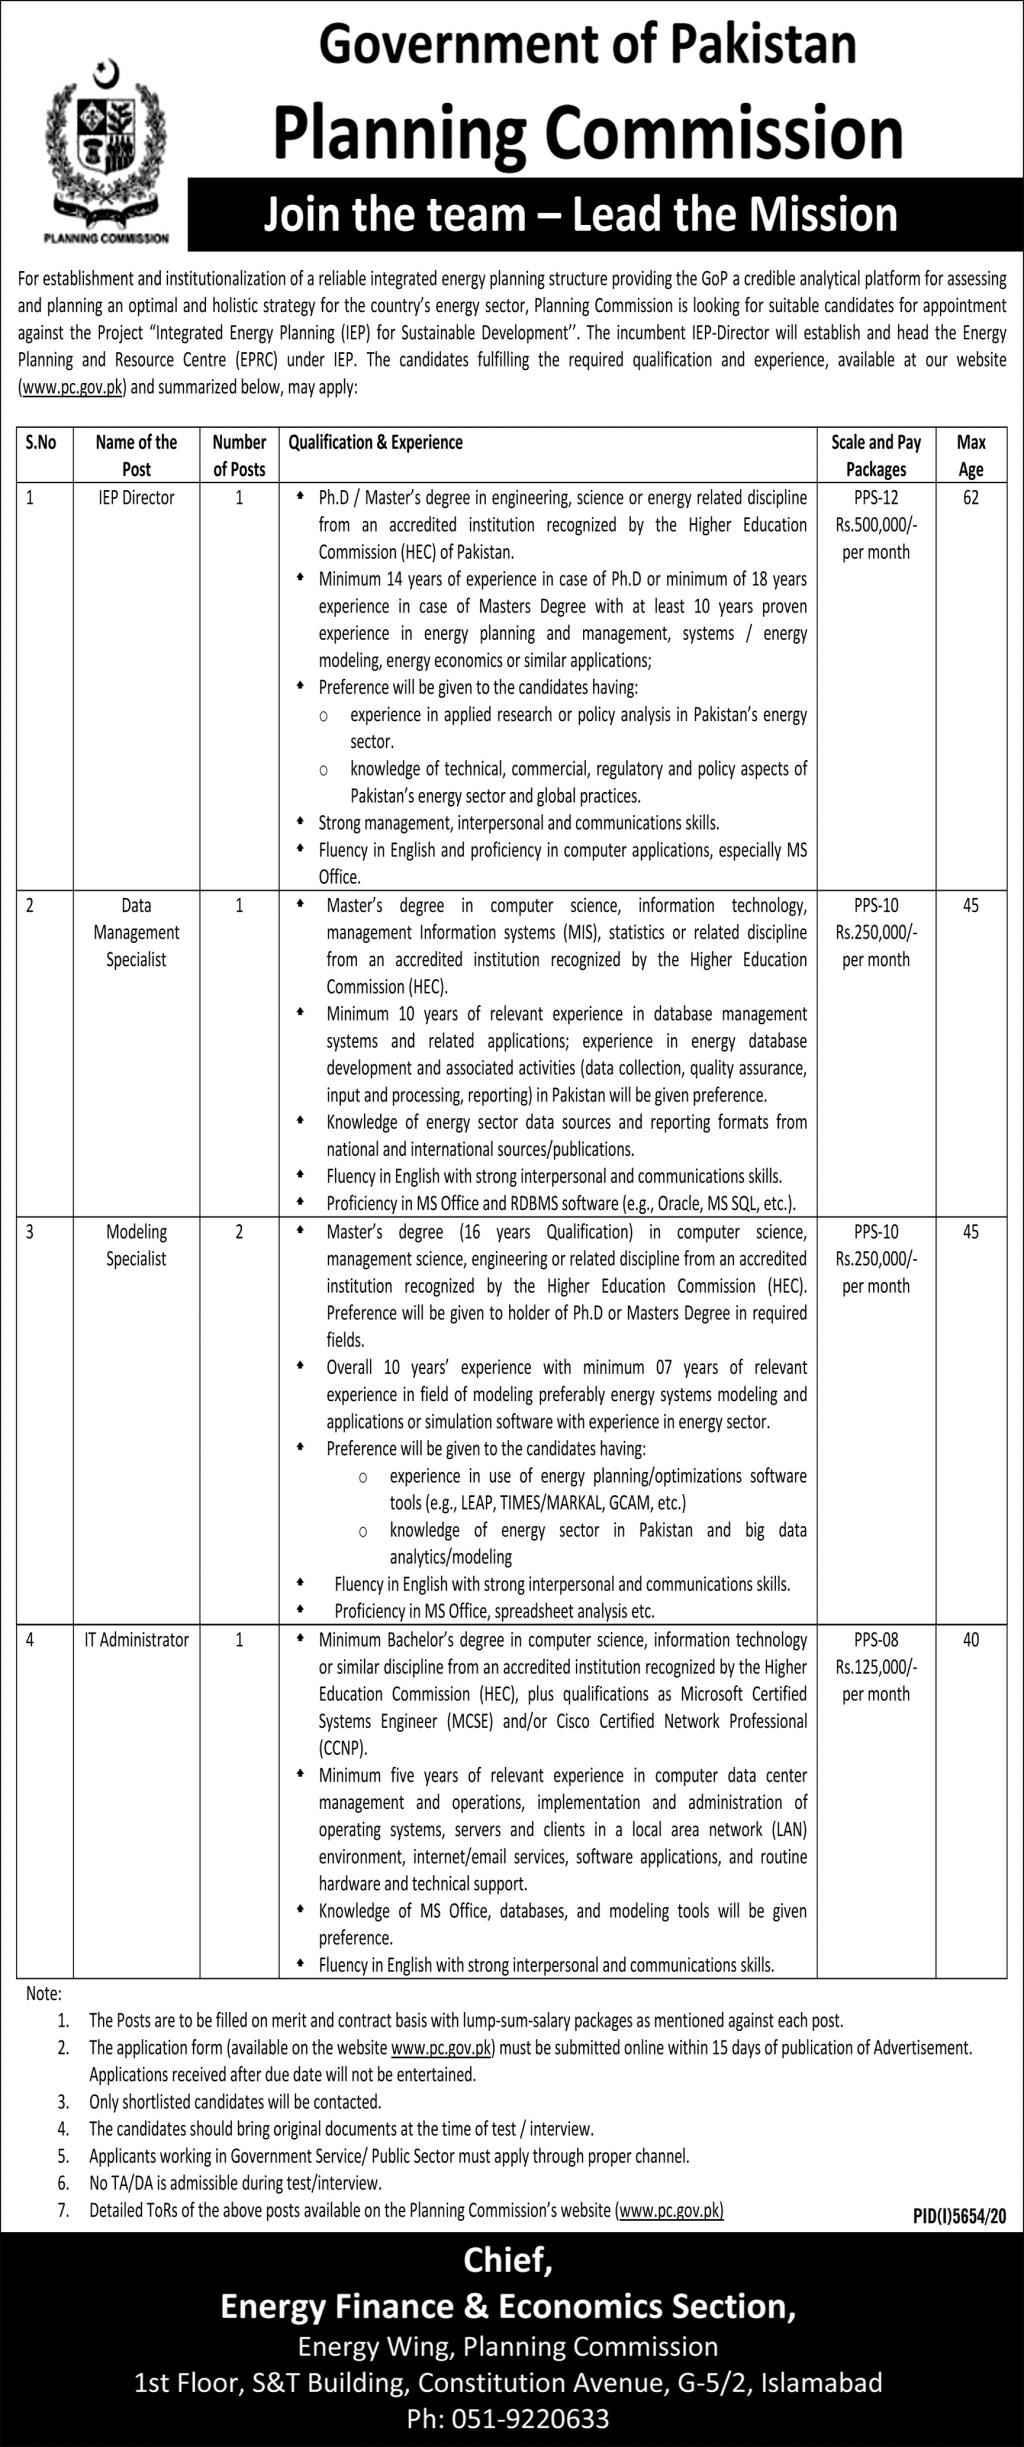 Energy Finance & Economics Section EFES Government of Pakistan Jobs 2021